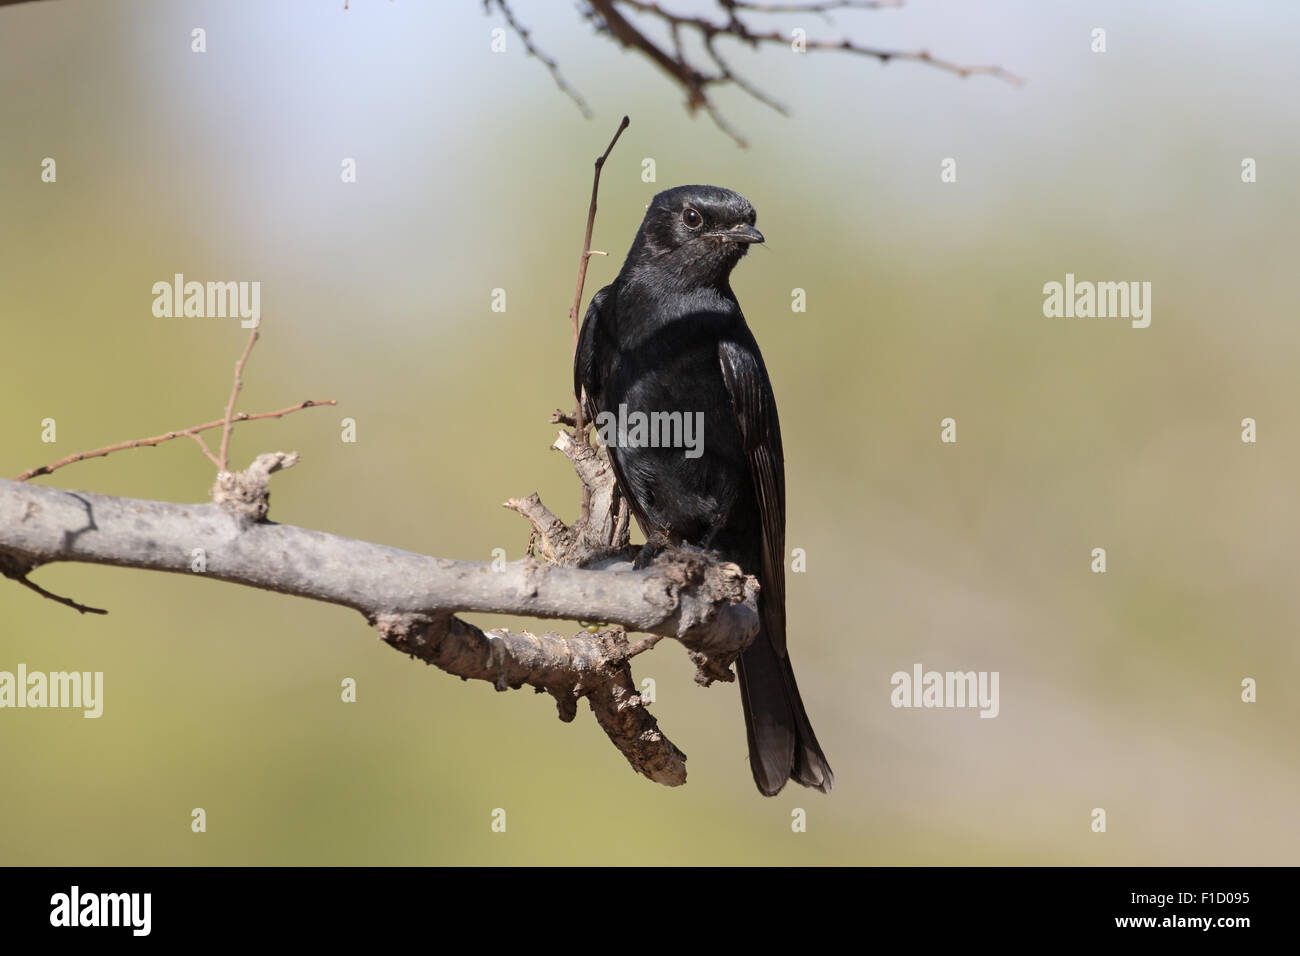 Southern black-flycatcher, Melaenornis pammelaina, single bird on branch, South Africa, August 2015 - Stock Image